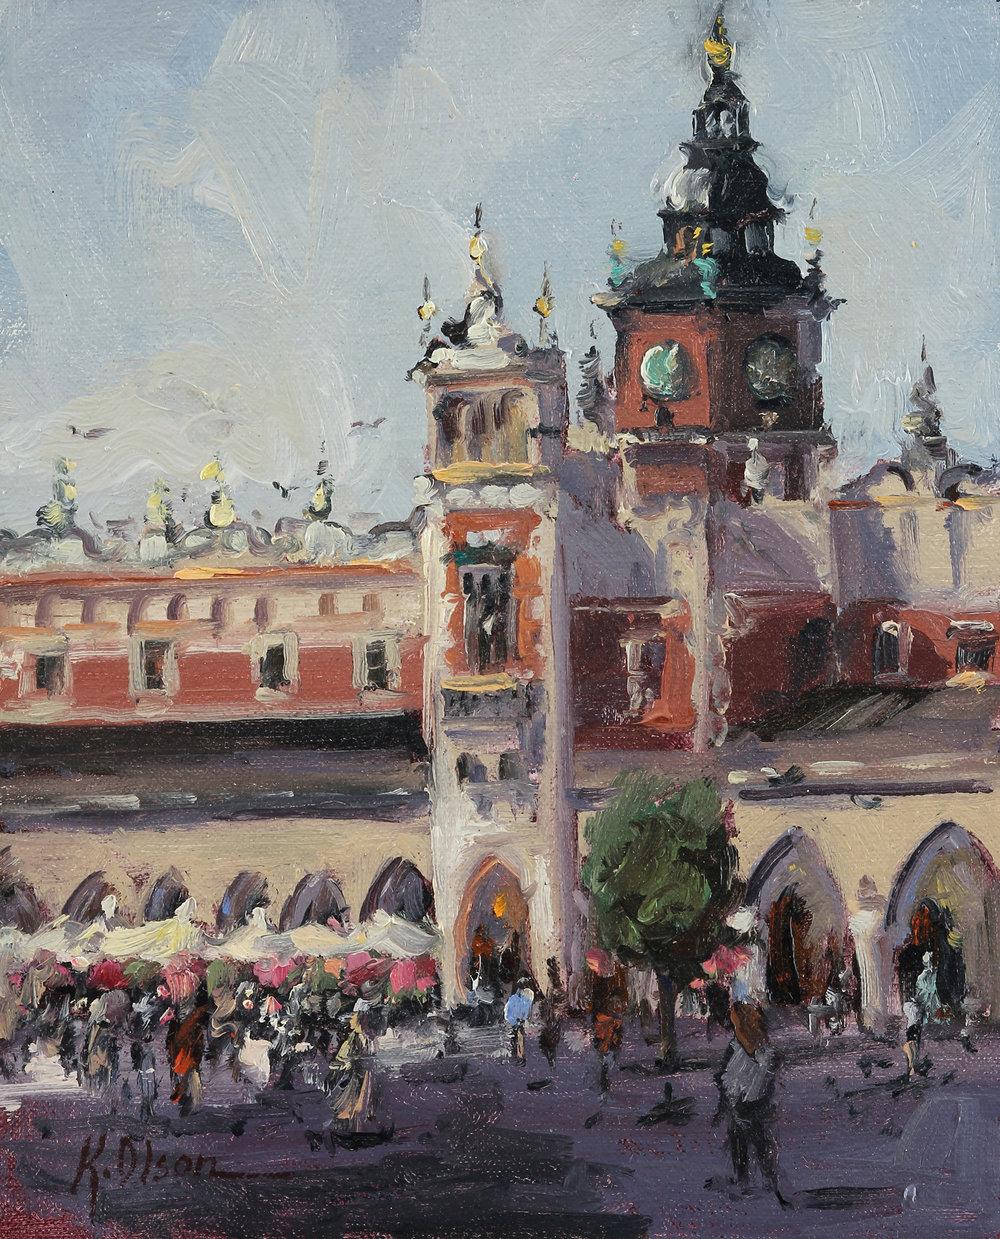 The Town Square, Krakow